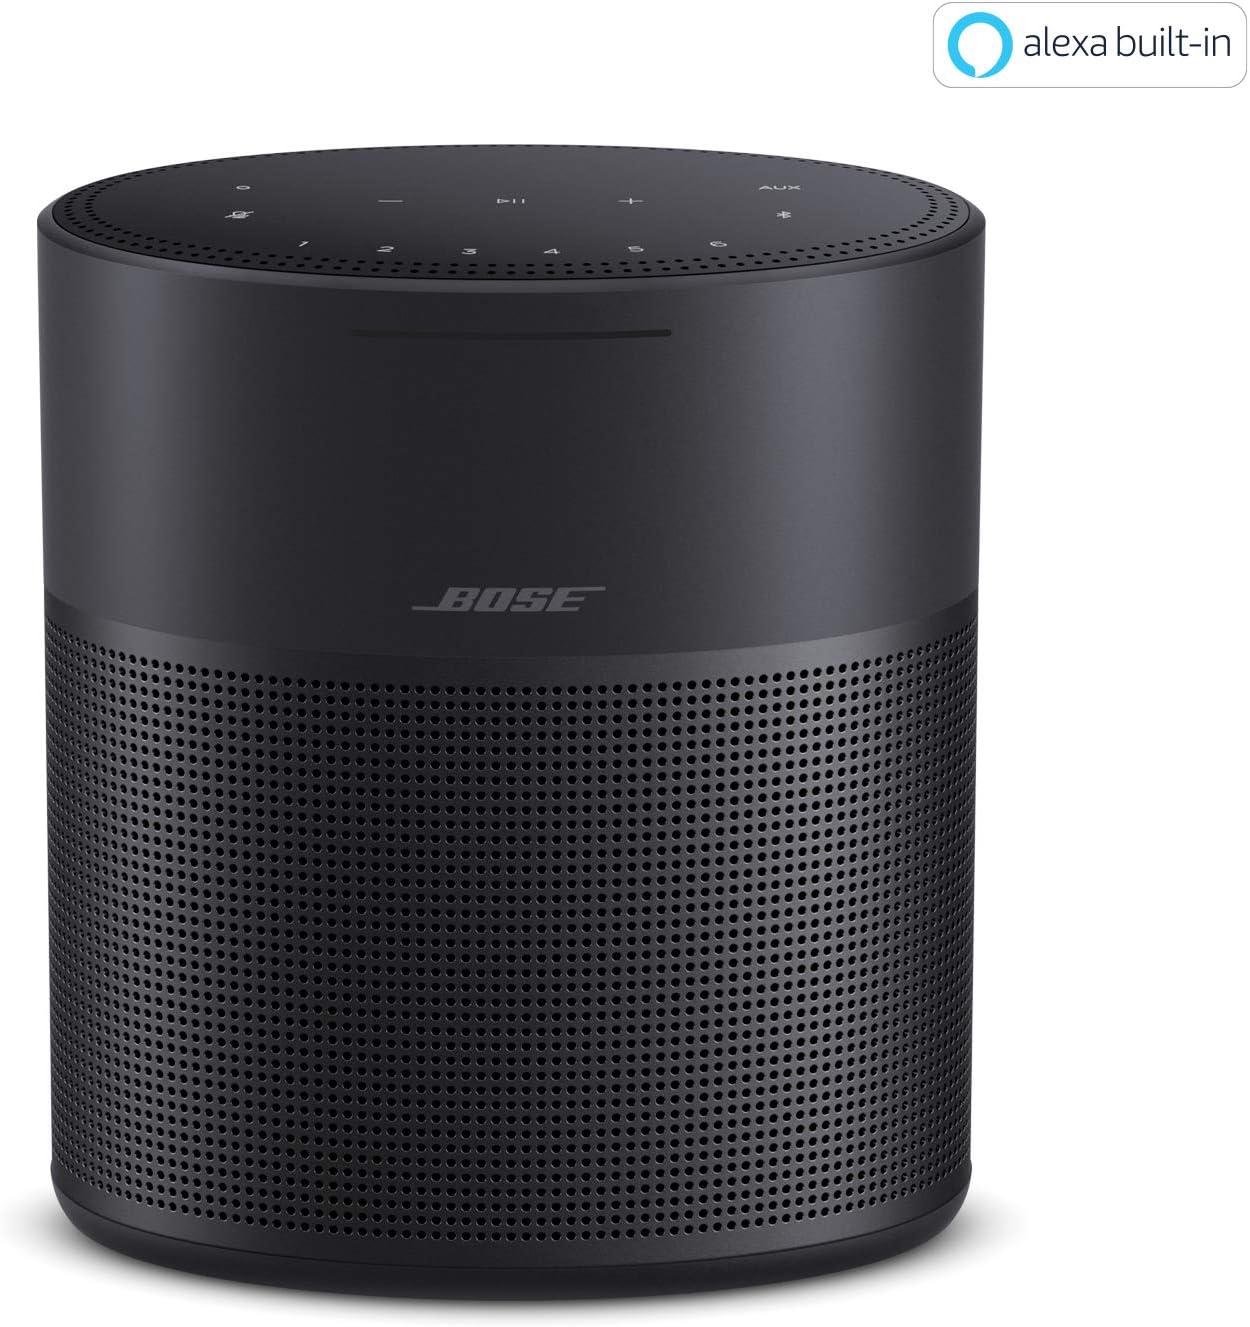 Bose Home Speaker 300, Amazon Alexa Built-in